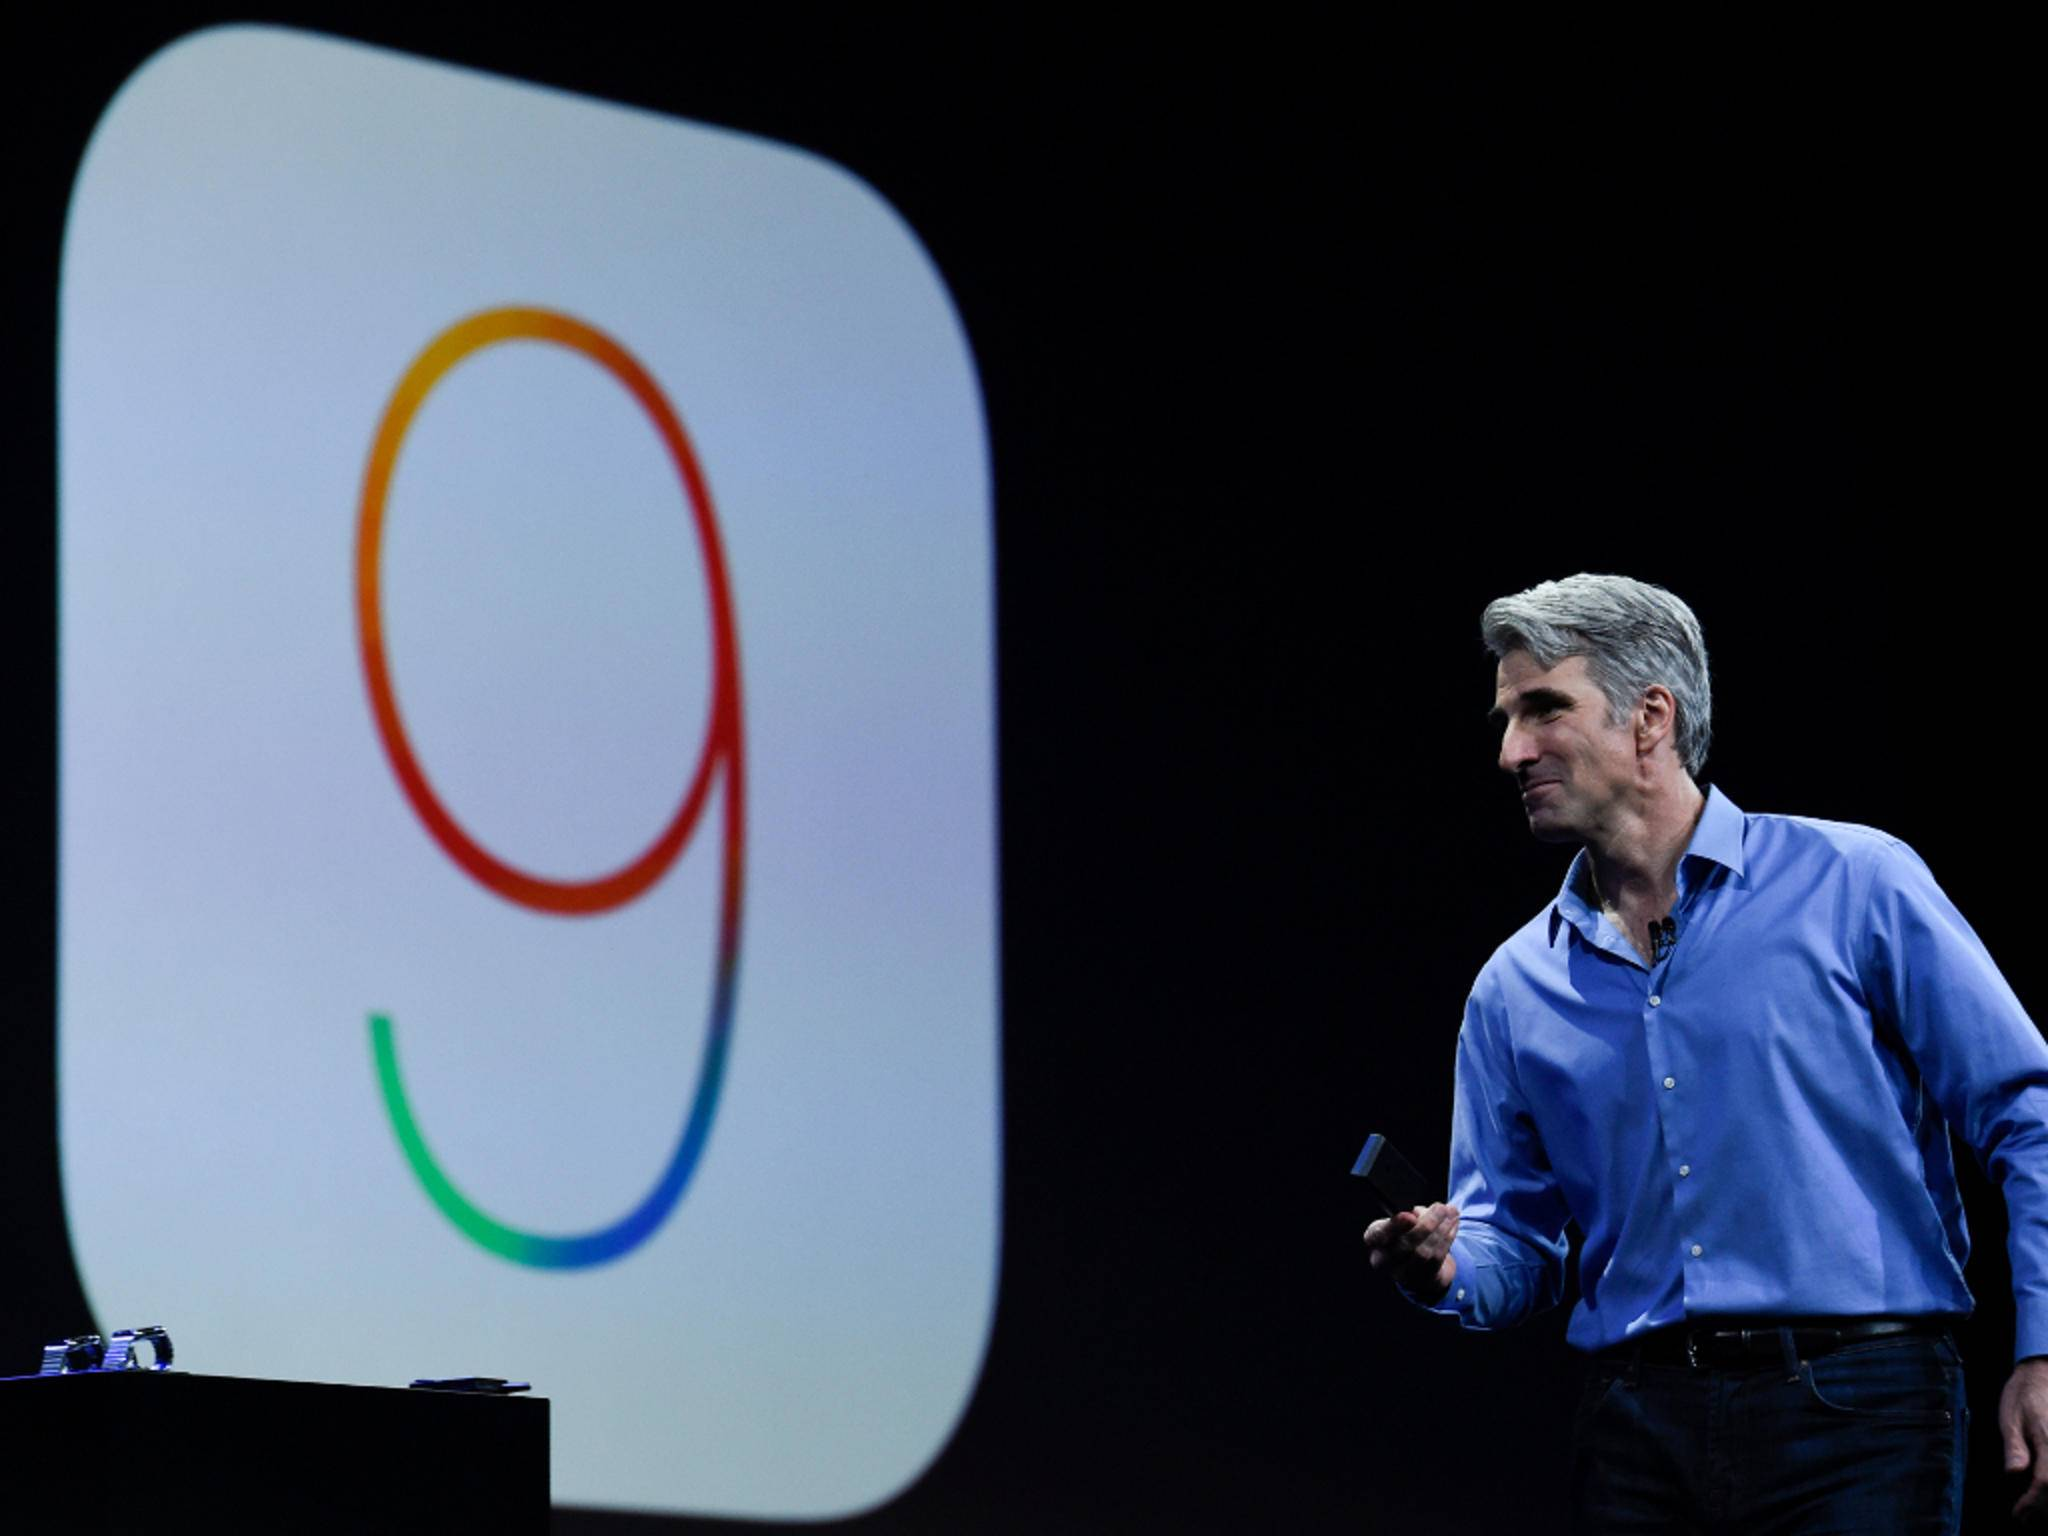 Craig Federighi führte auf der Keynote durch iOS 9.